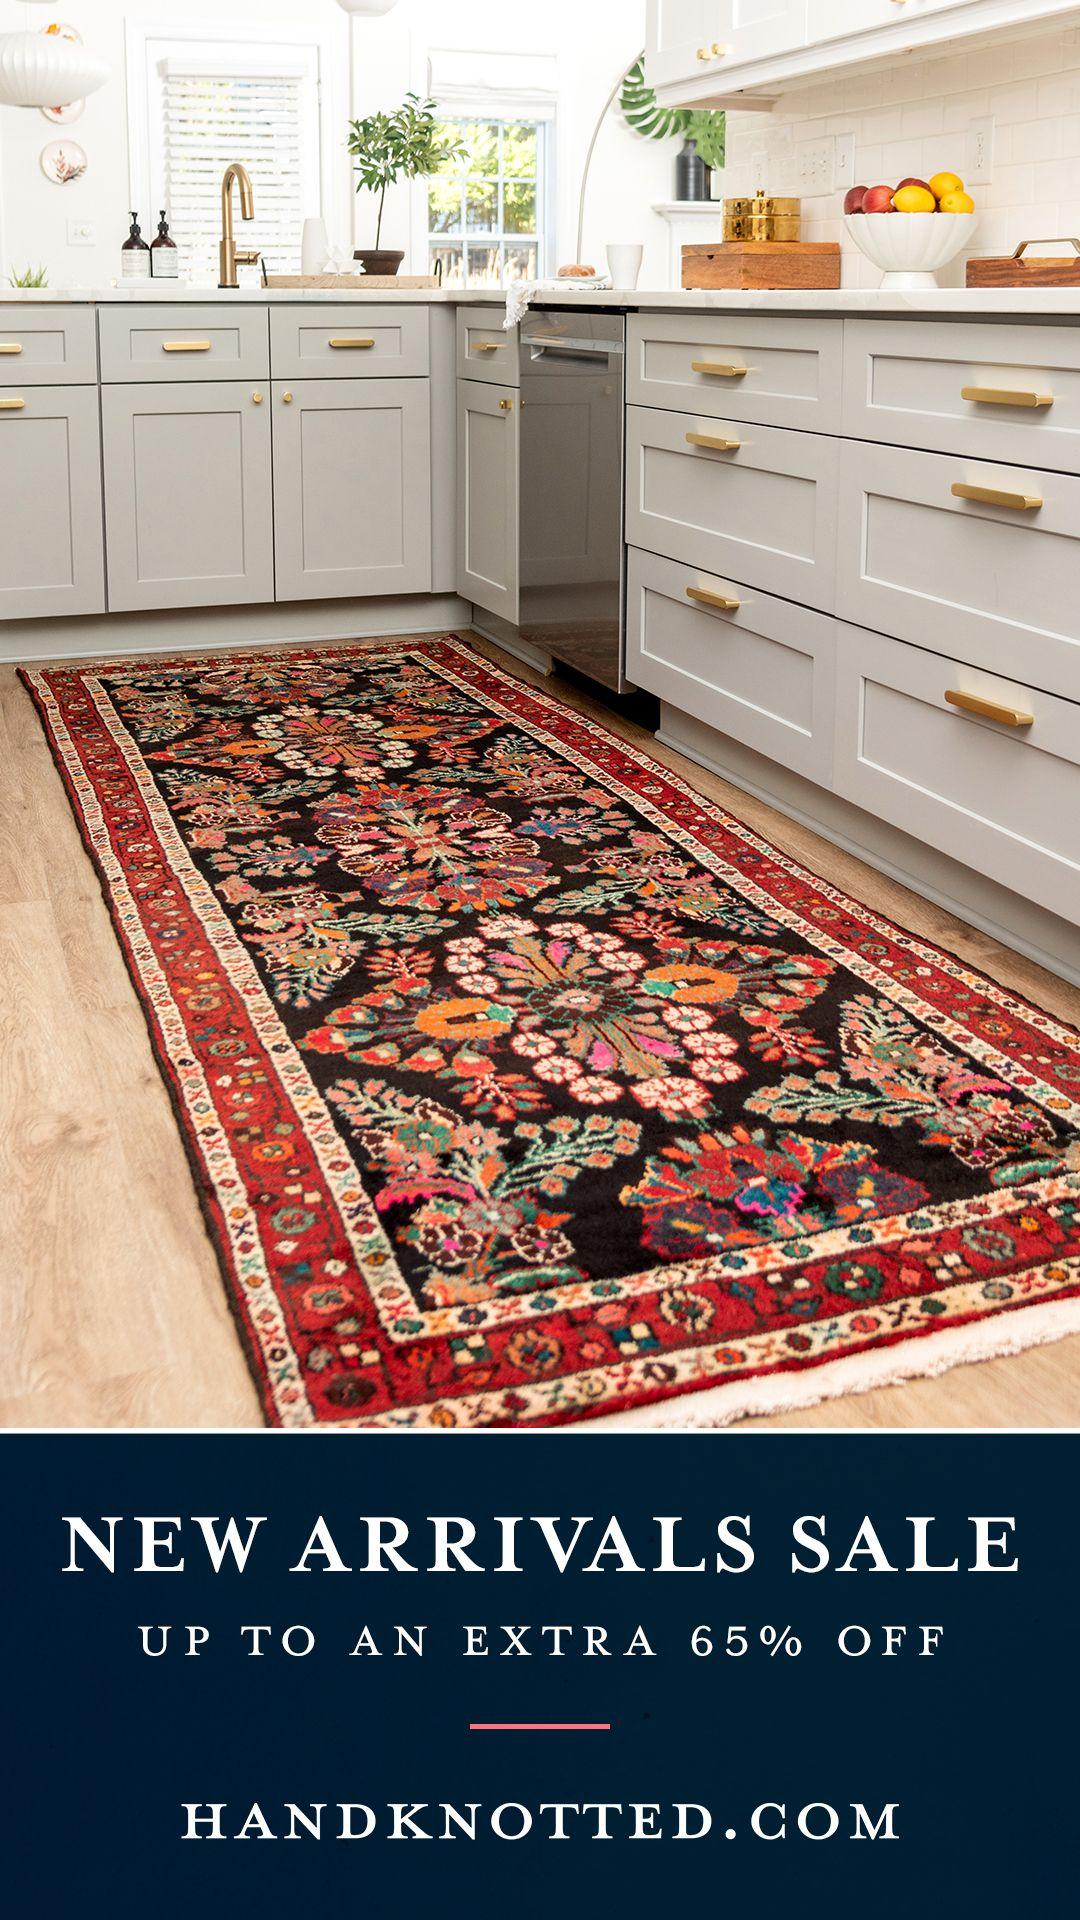 I Found This Amazing 2pcs Set Kitchen Floor Carpet Non Slip Area